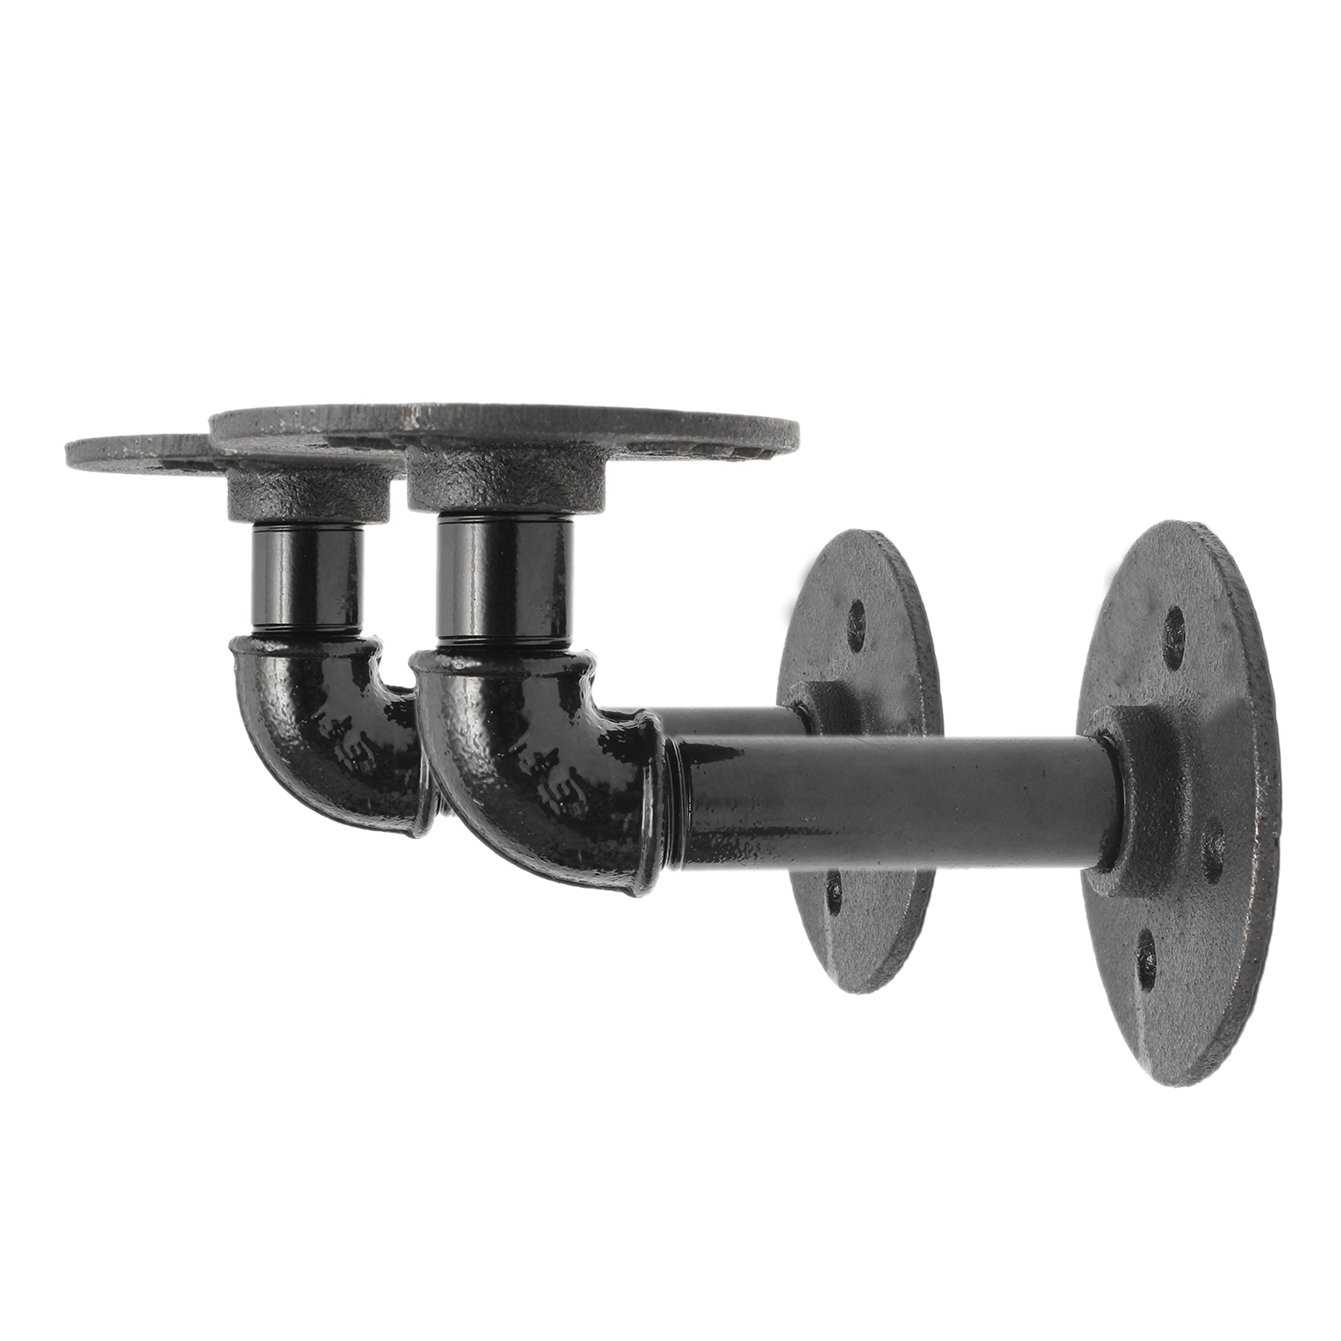 QIZIANG 2 Stücke Steampunk Industrierohrgerüst Bord Regal Regal Regal Klammern Schwarz Eisen 14x9 cm Hot B07Q6HW1DZ Multifunktionswerkzeuge Kunde zuerst 035a85